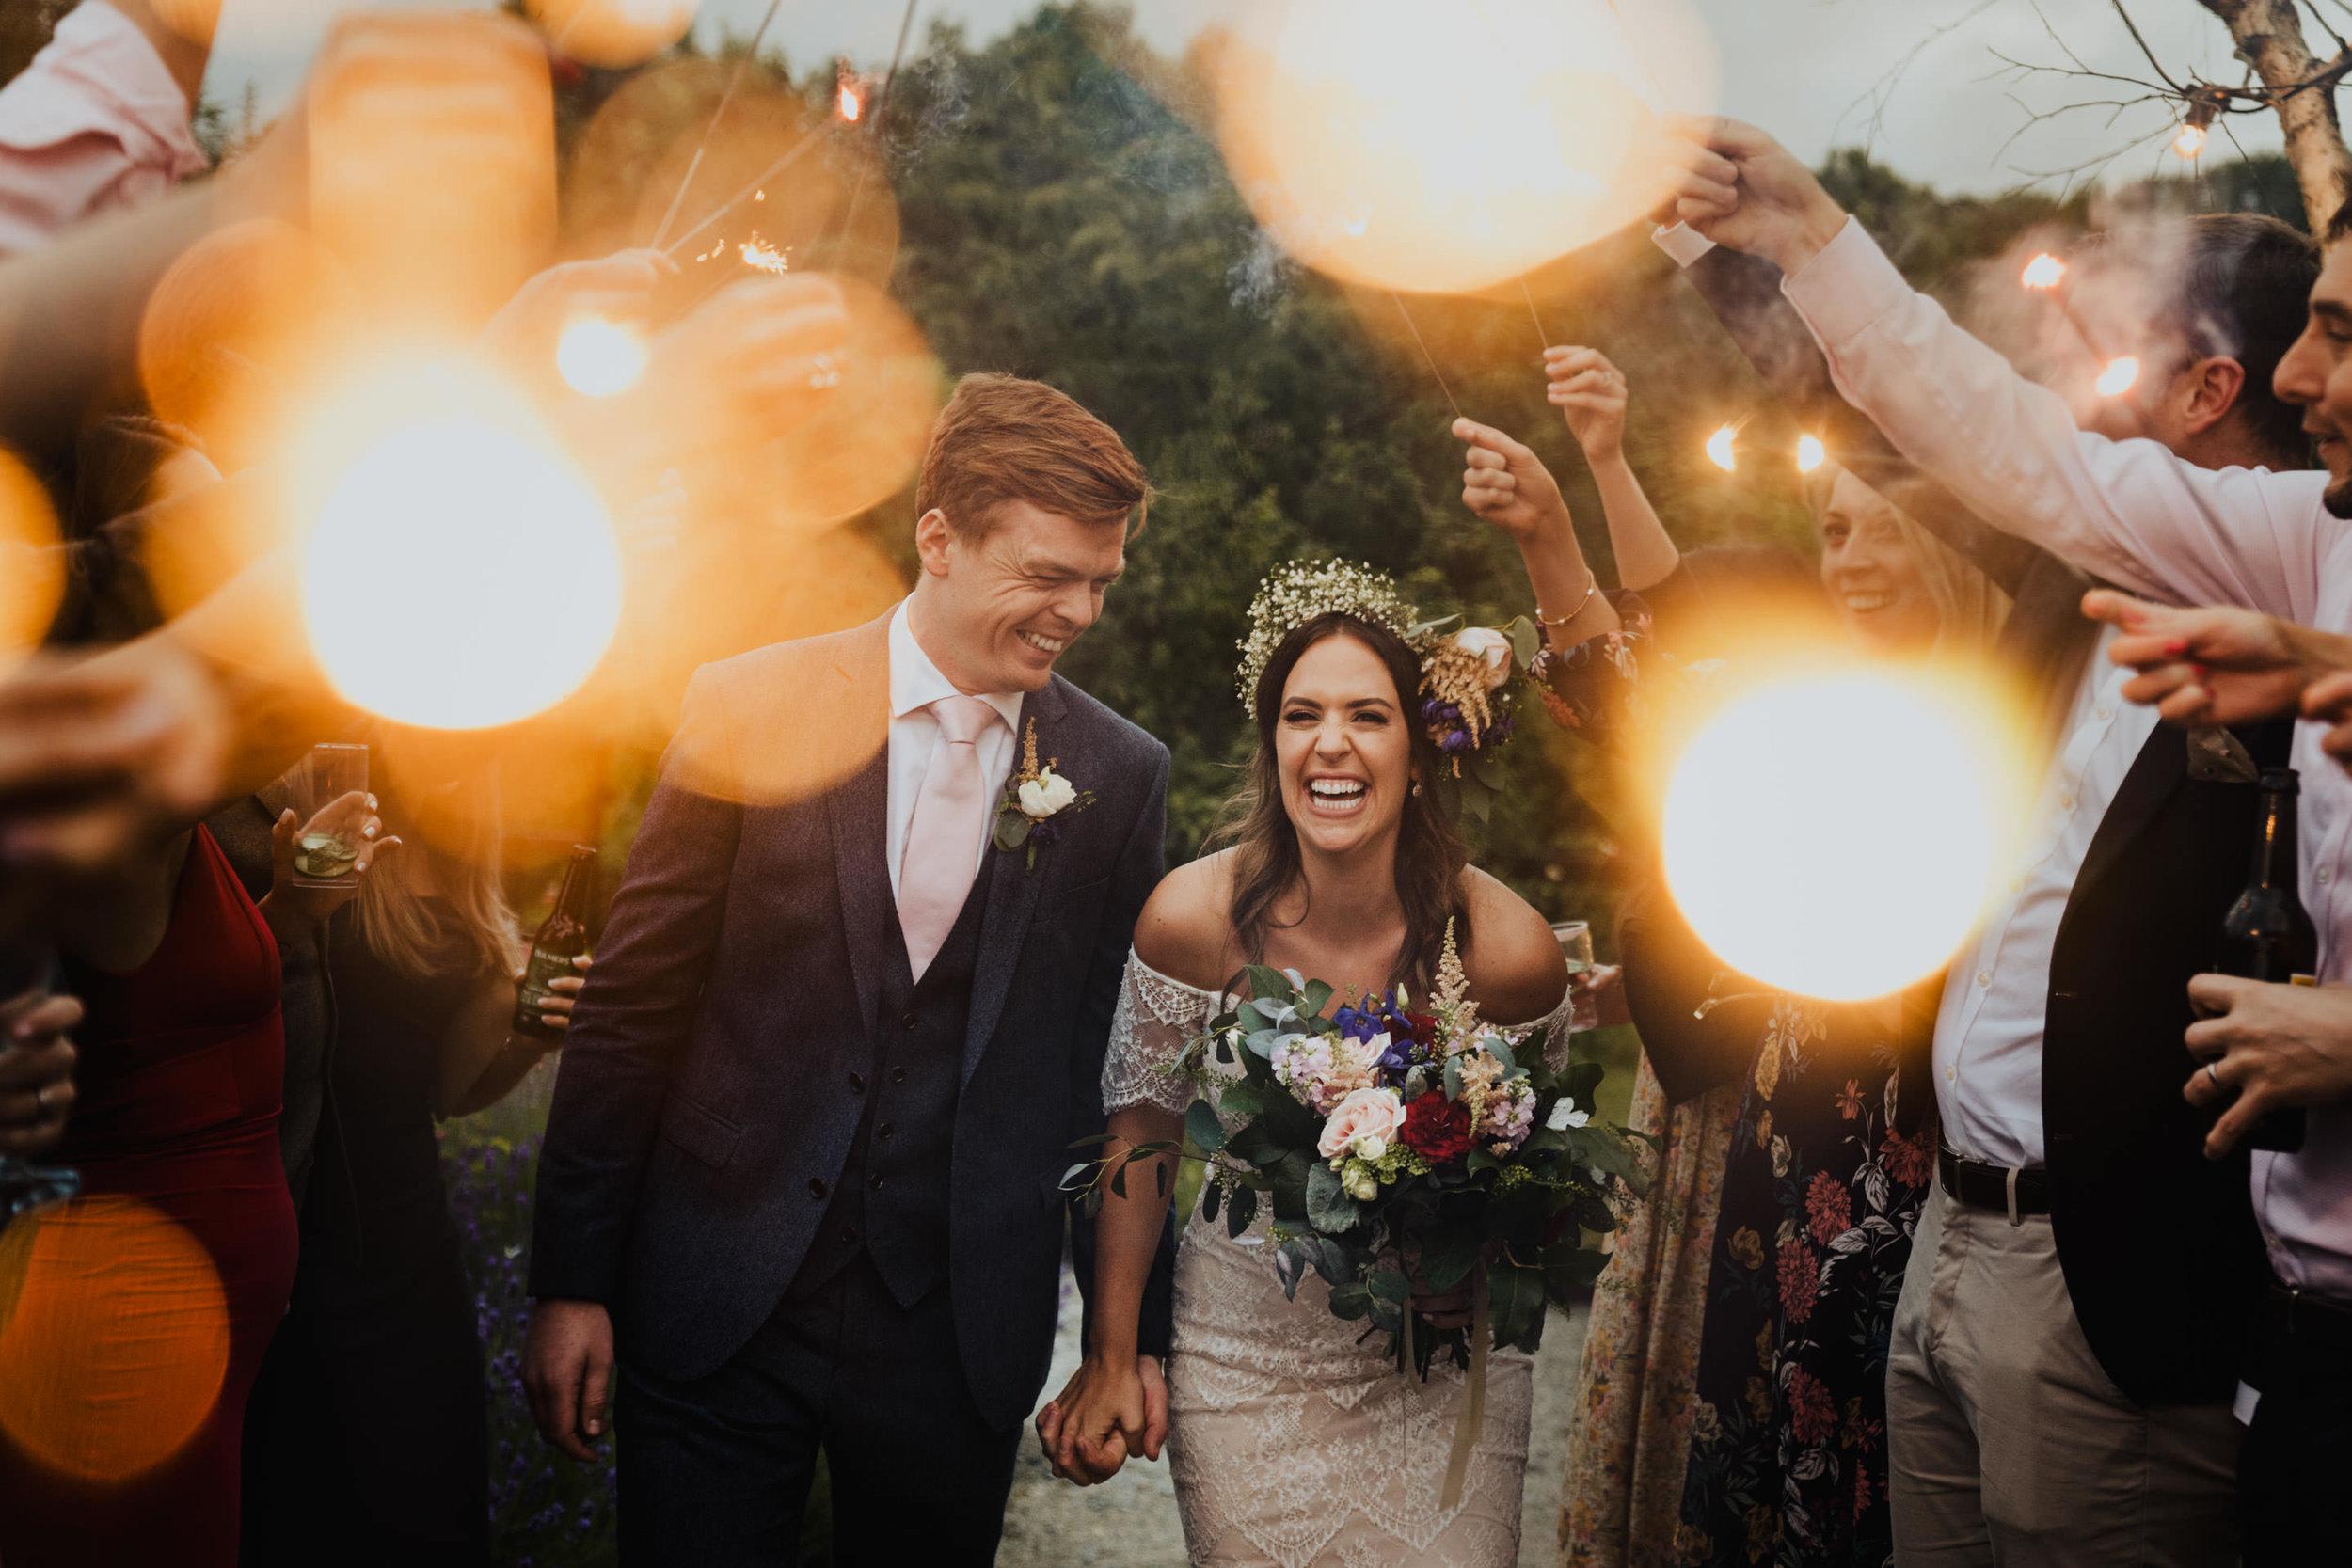 c&j_brigits_garden_galway_wedding_photographer_livia_figueiredo_42.jpg